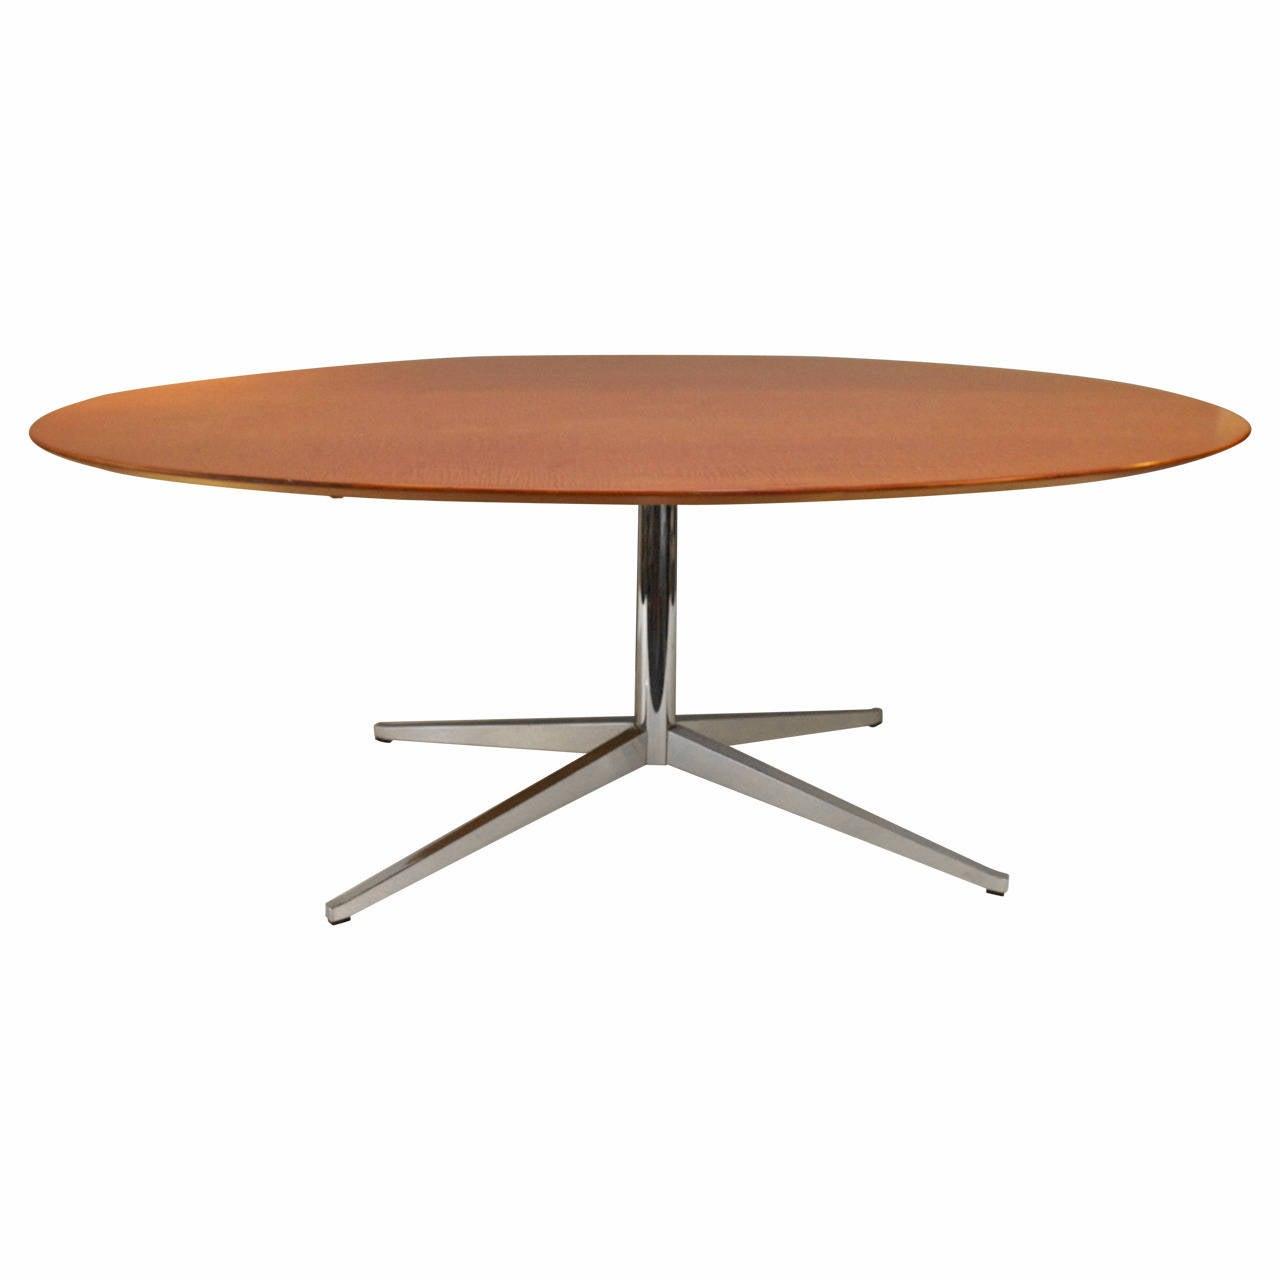 Burl Wood Oval Florence Knoll Table/Desk 1